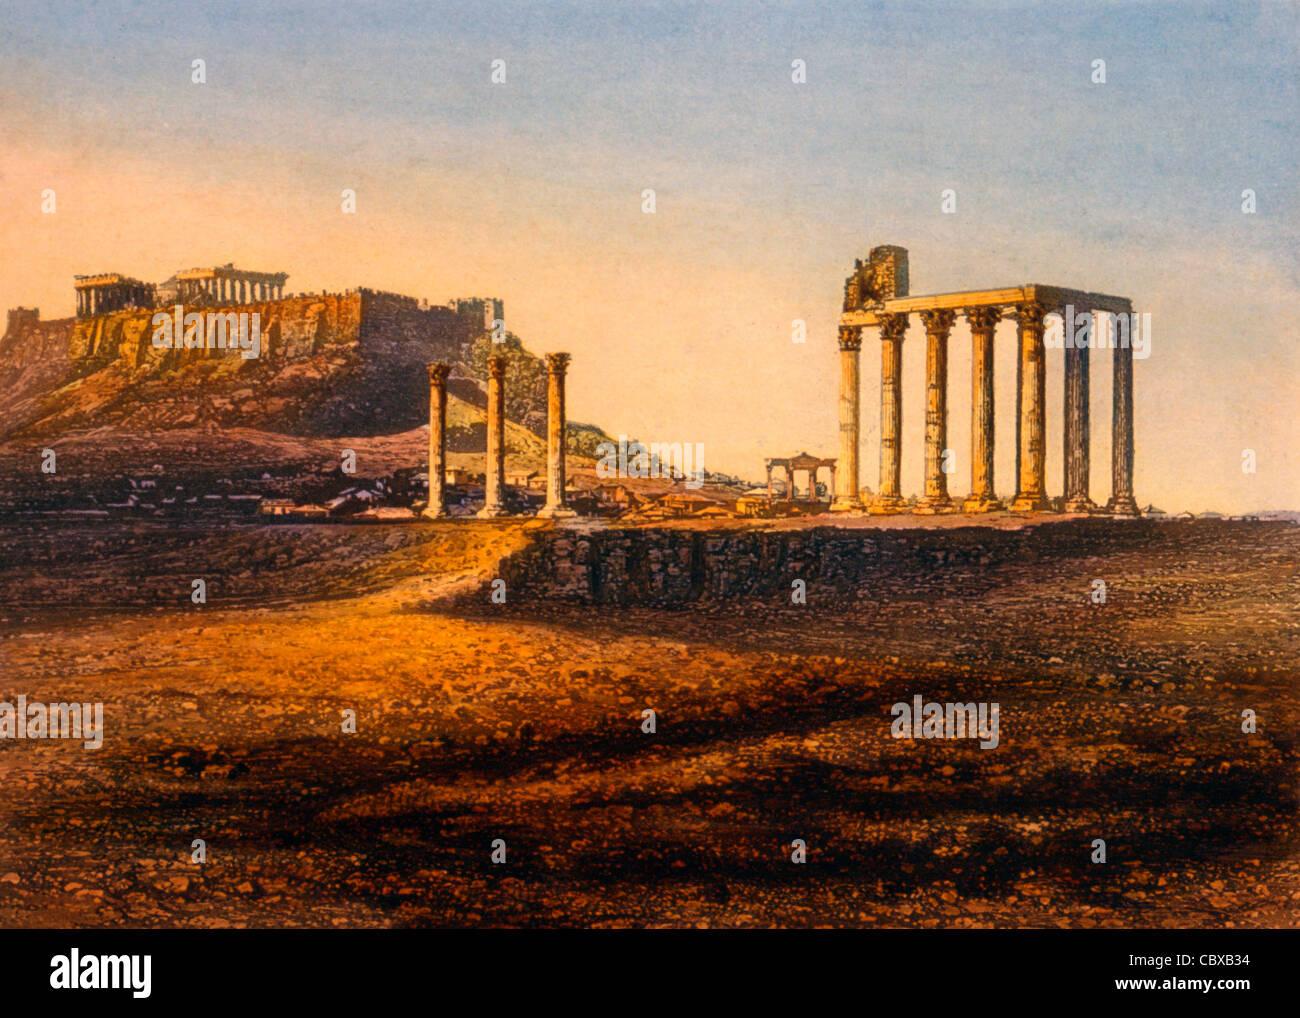 Vista de la Acrópolis, Atenas, Grecia, circa1842 Imagen De Stock